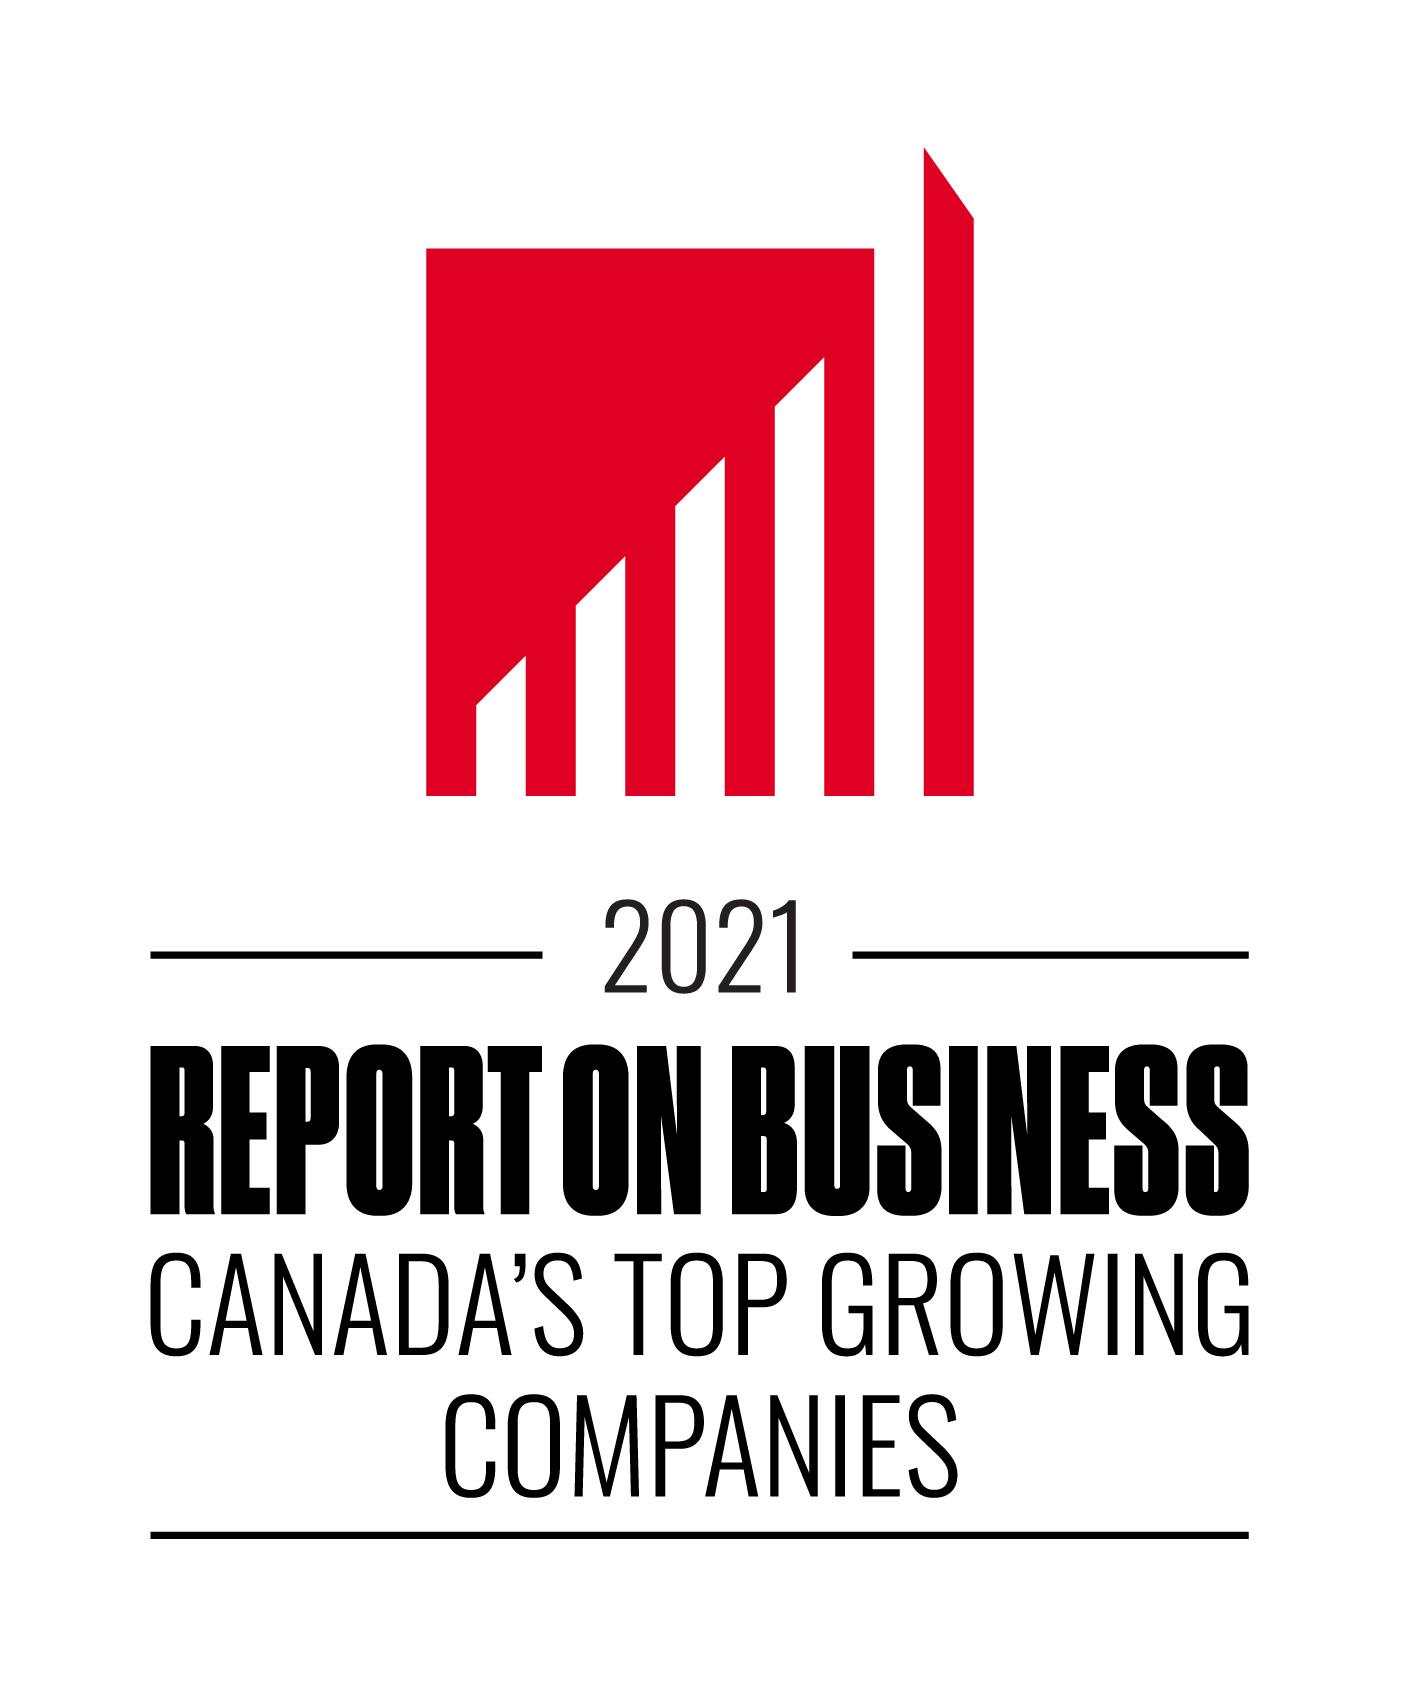 canadas top growing companies